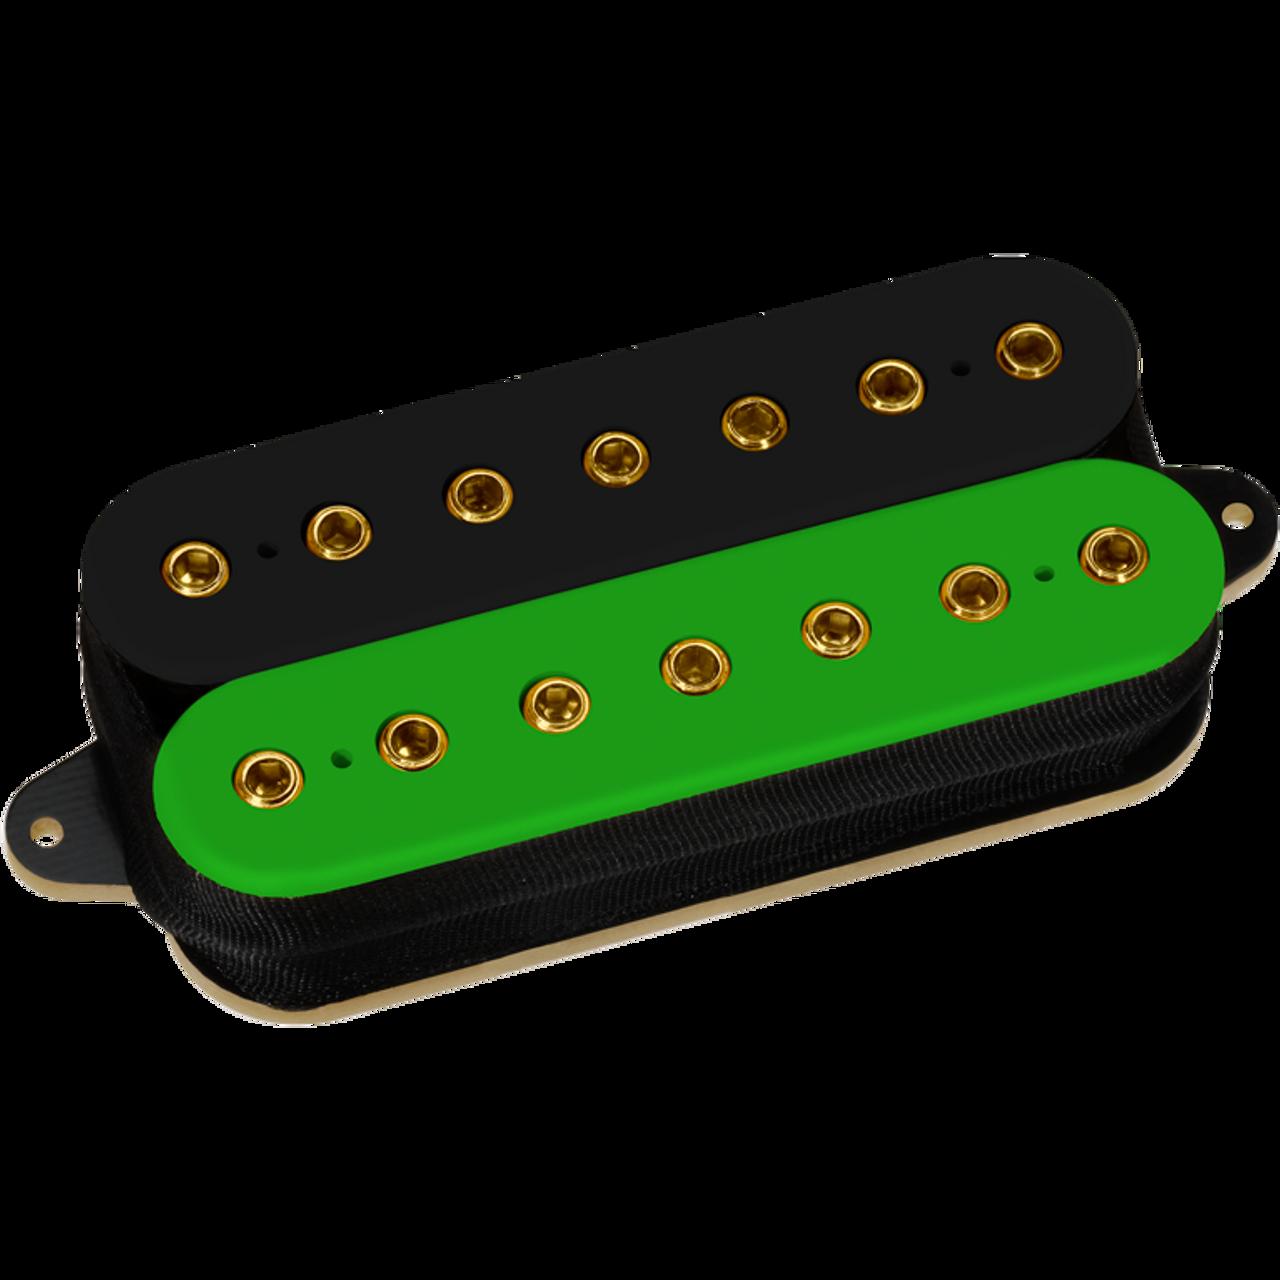 DiMarzio LiquiFire Pickup - Black Green DP707BK+G